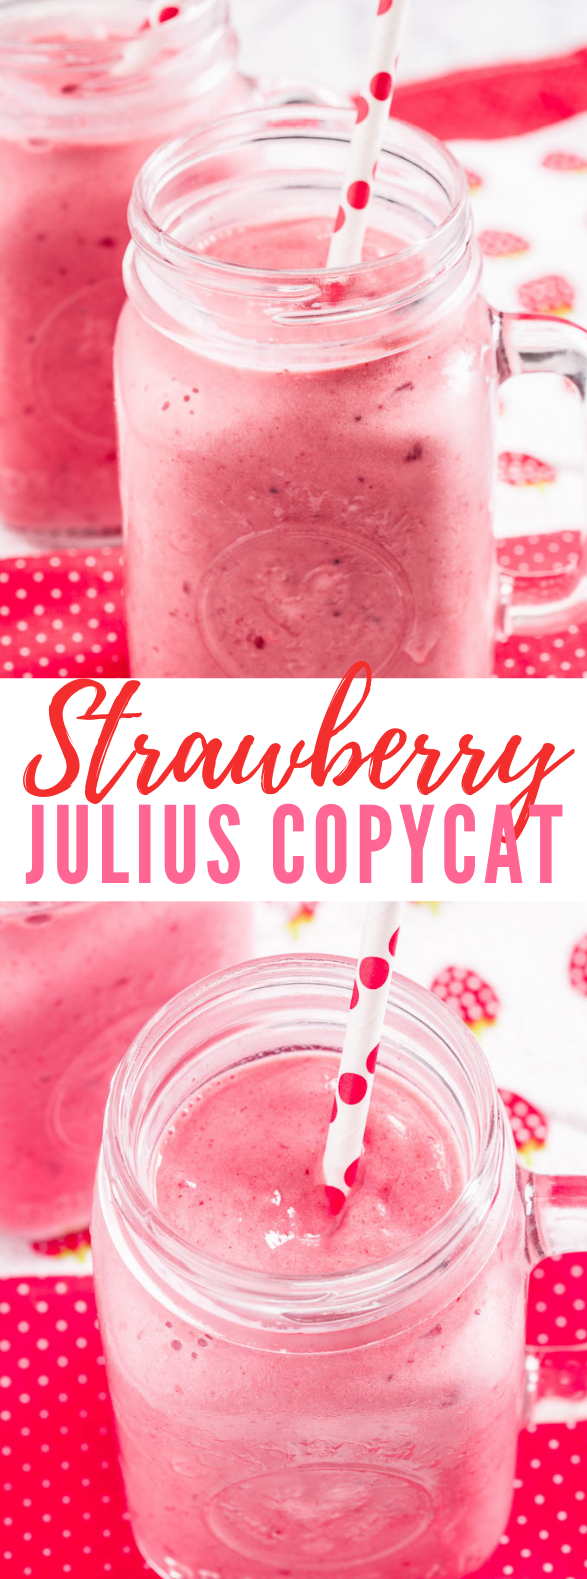 STRAWBERRY JULIUS RECIPE (4 INGREDIENTS) #drinks #healthydrinks